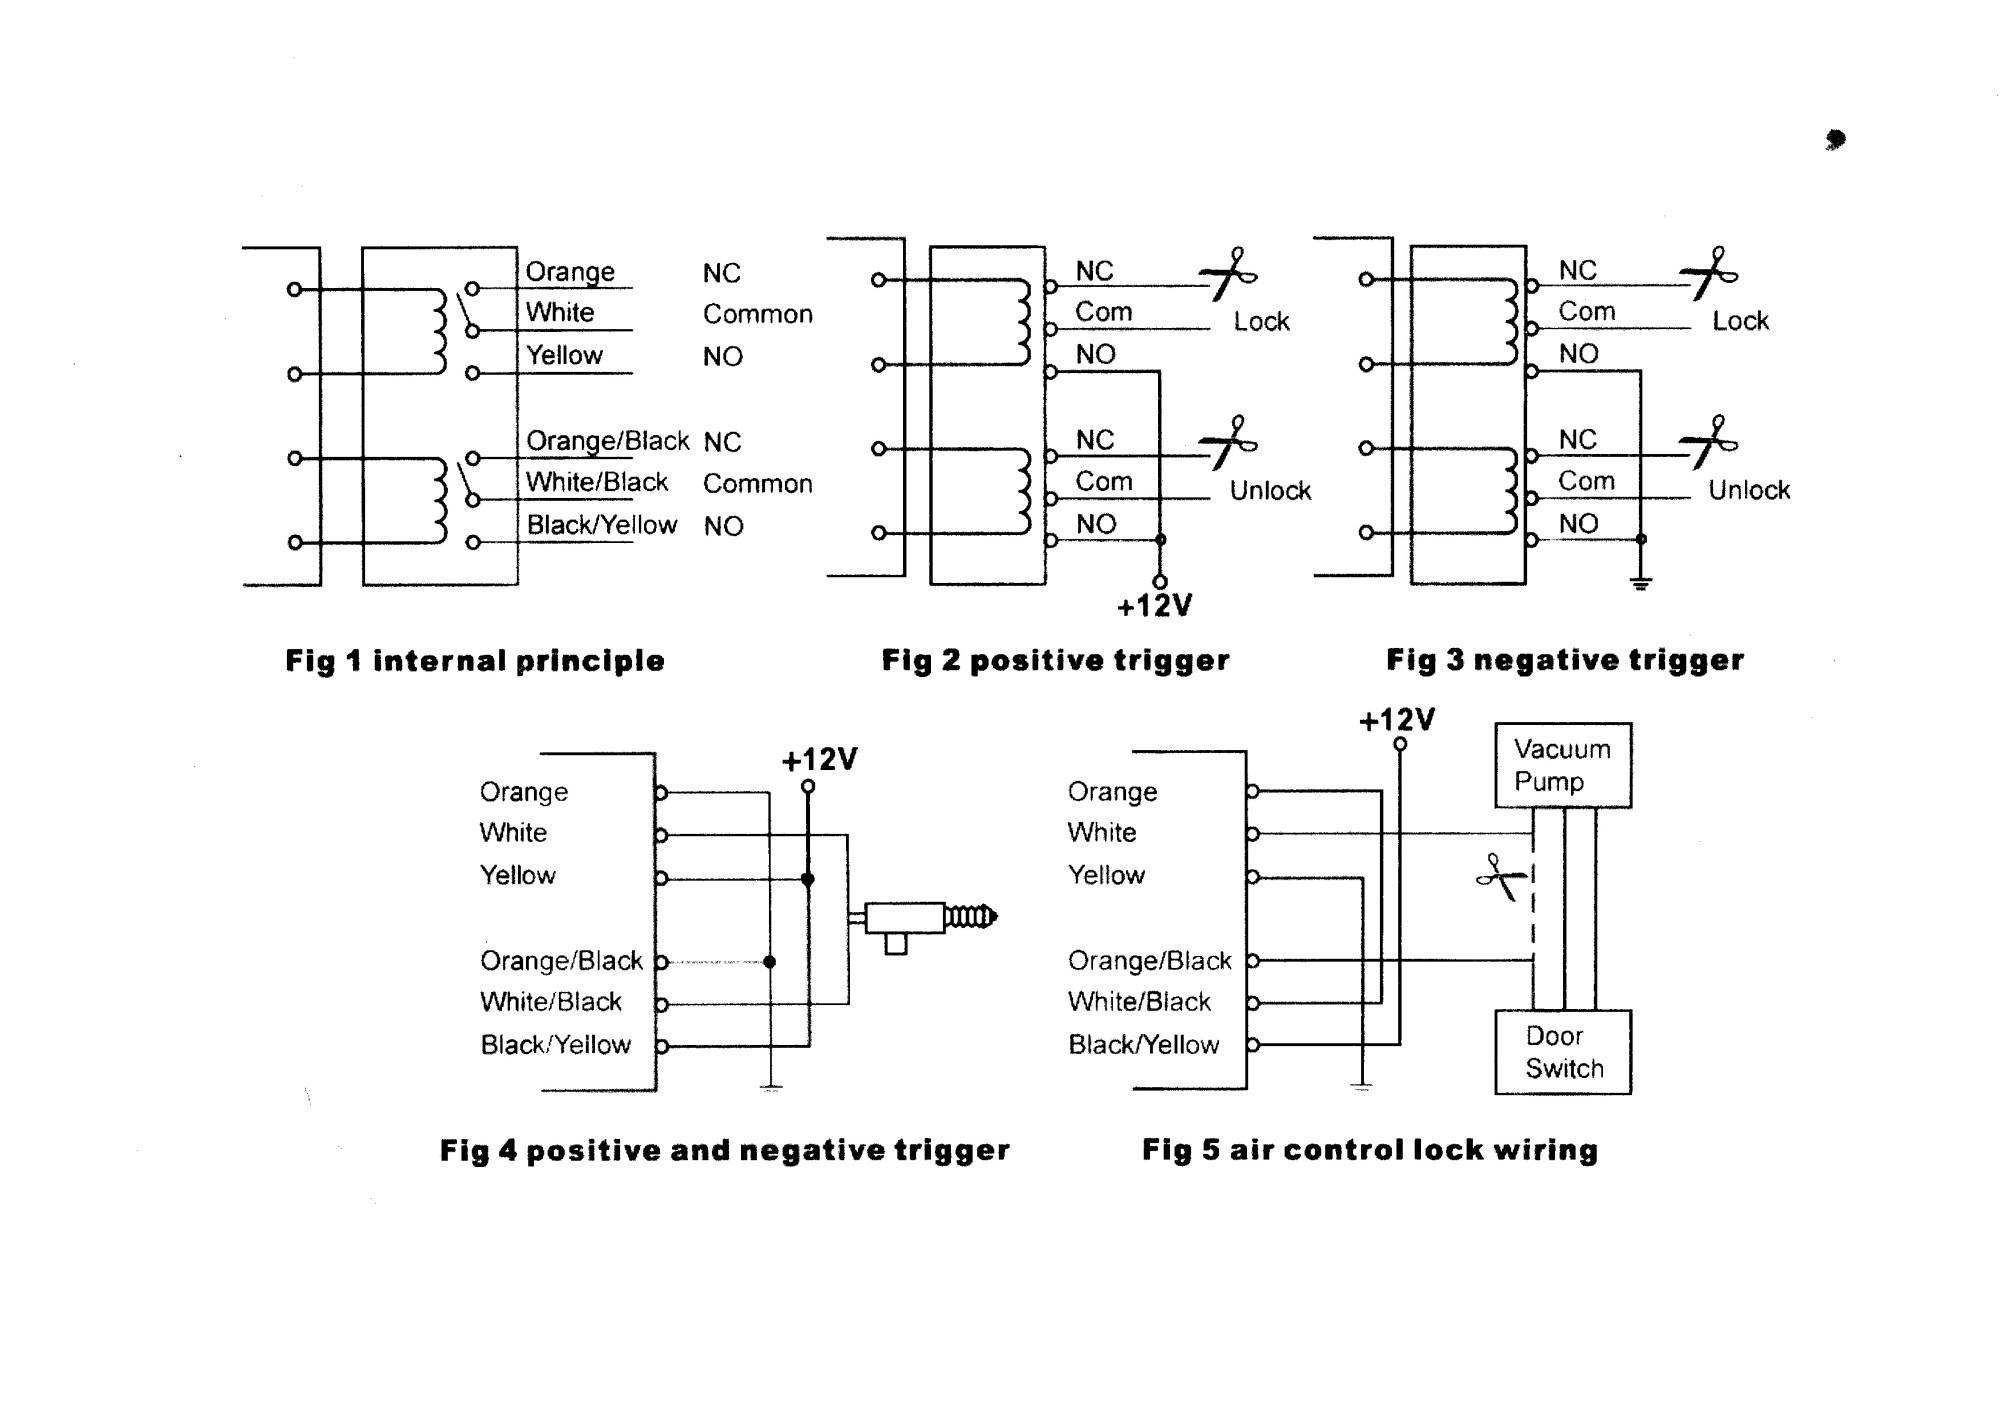 hight resolution of original paper schematic page 2 of 2 jpg